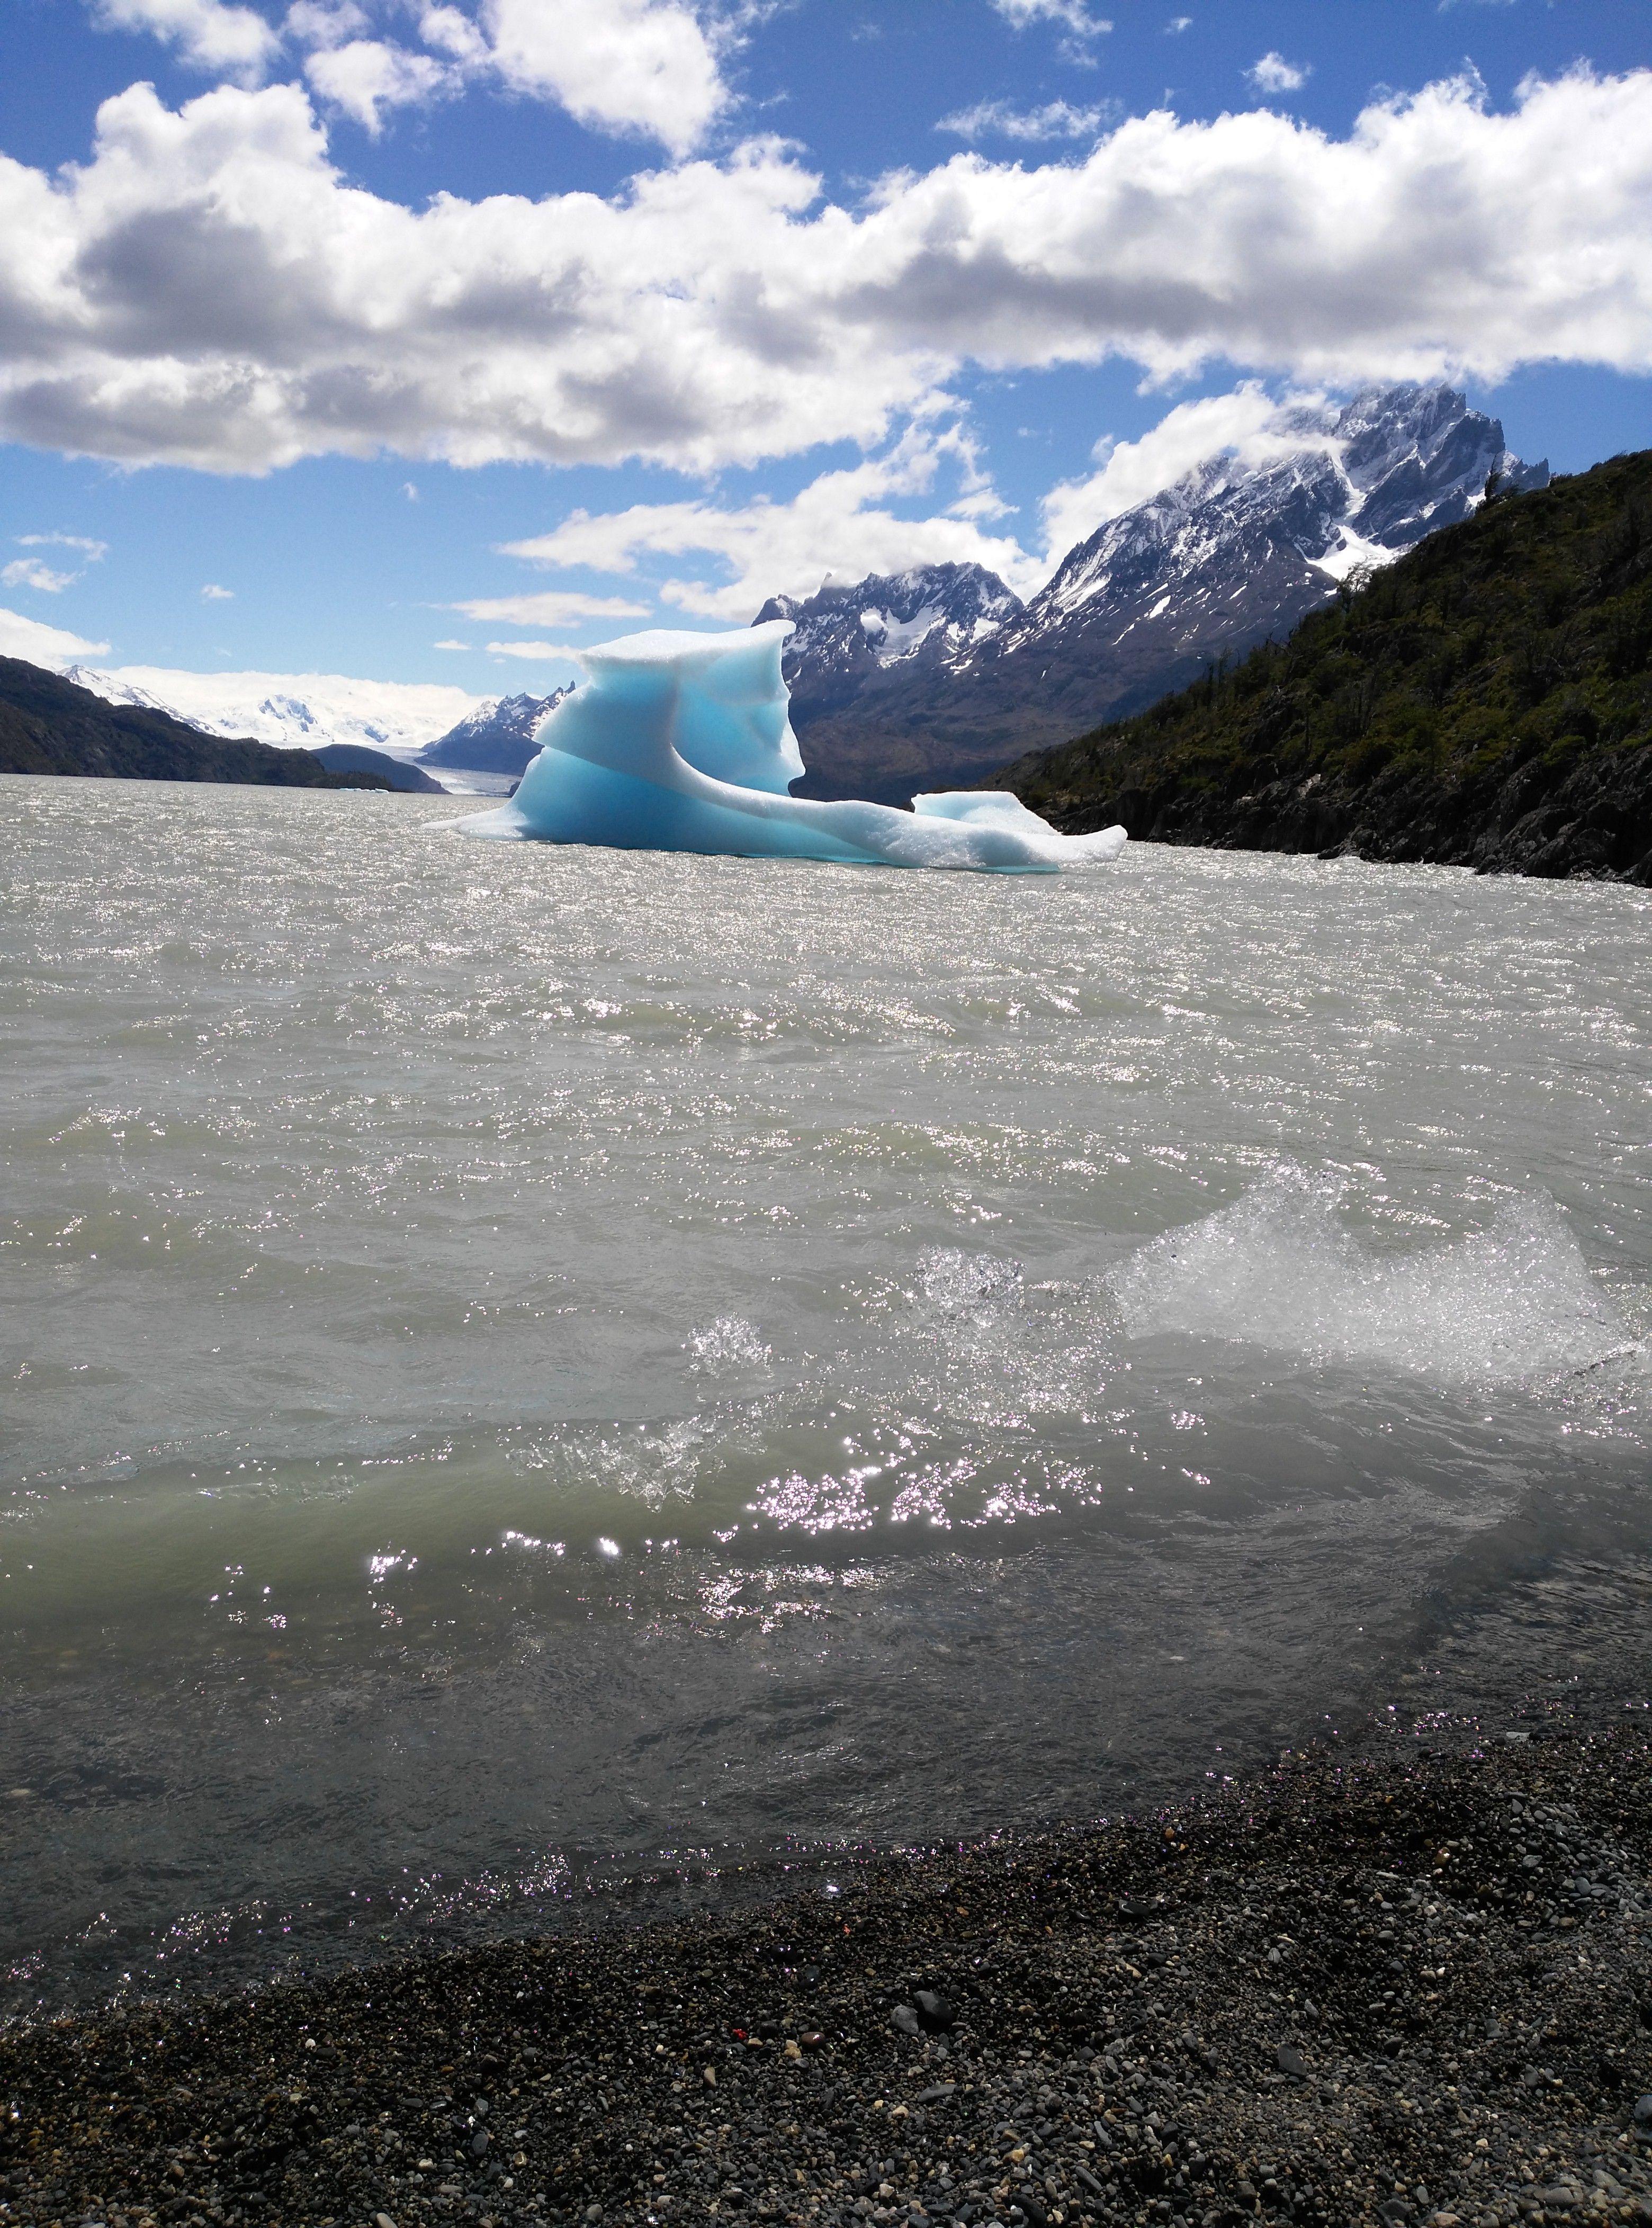 Visita al fin del mundo: Patagonia chilena #travelbloggers #viajar #viajes #travelling #Chile #Patagonia #TorresdelPaine